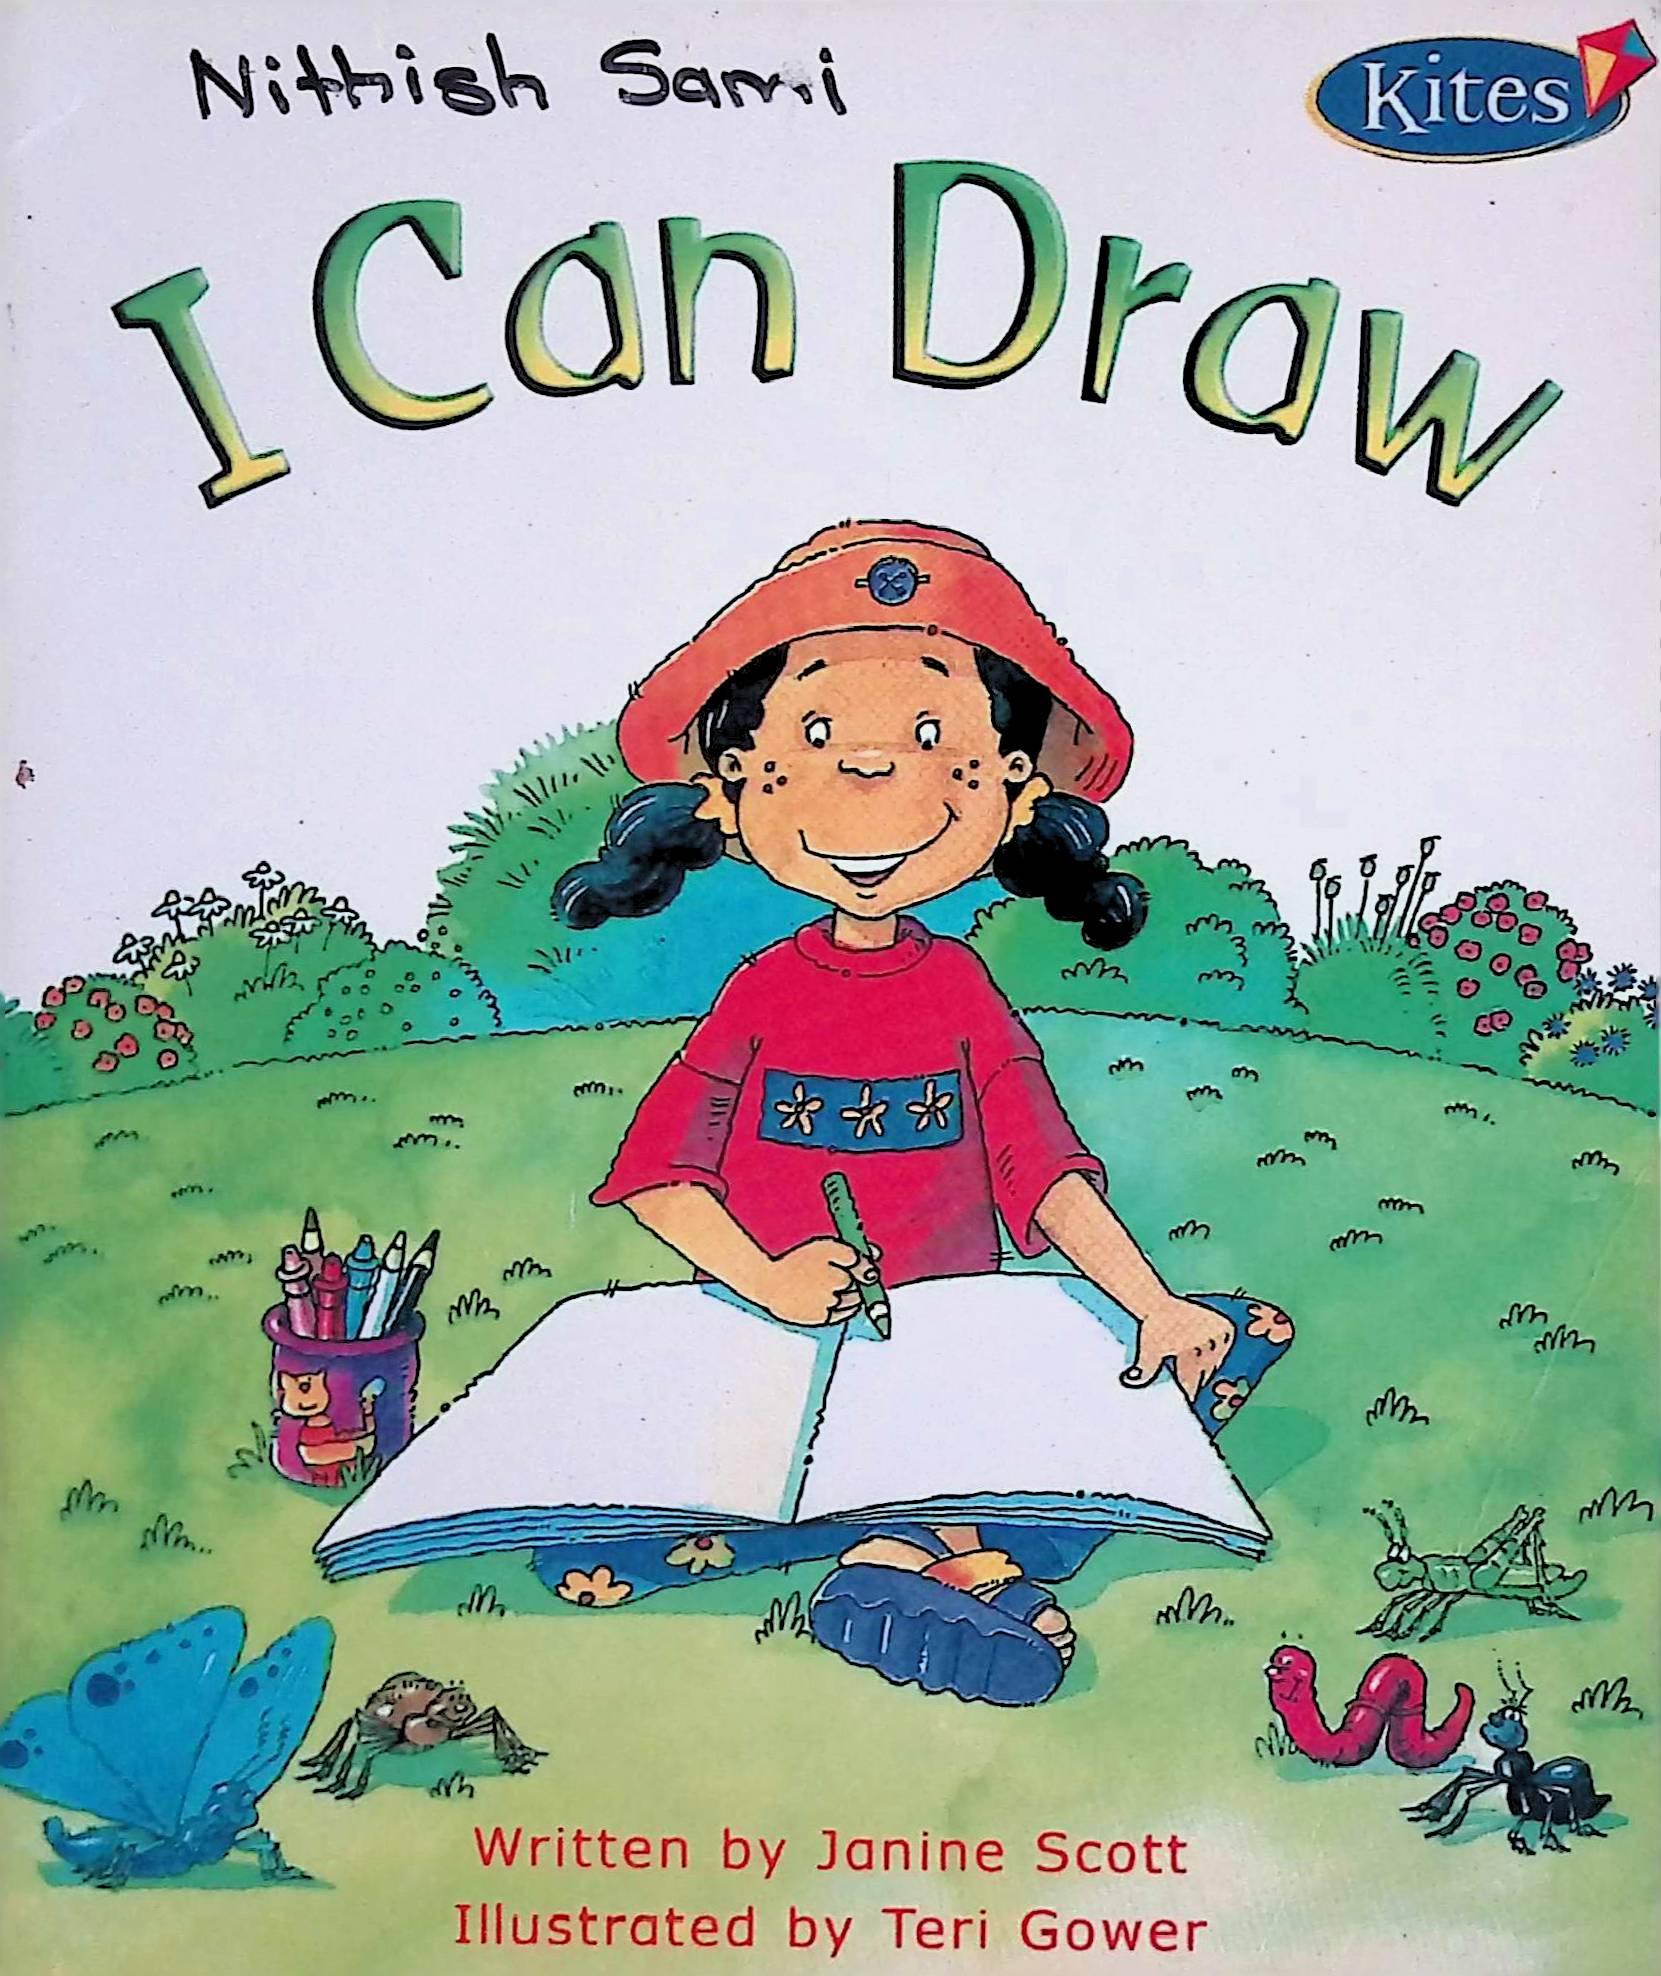 I can draw / written by Janine Scott